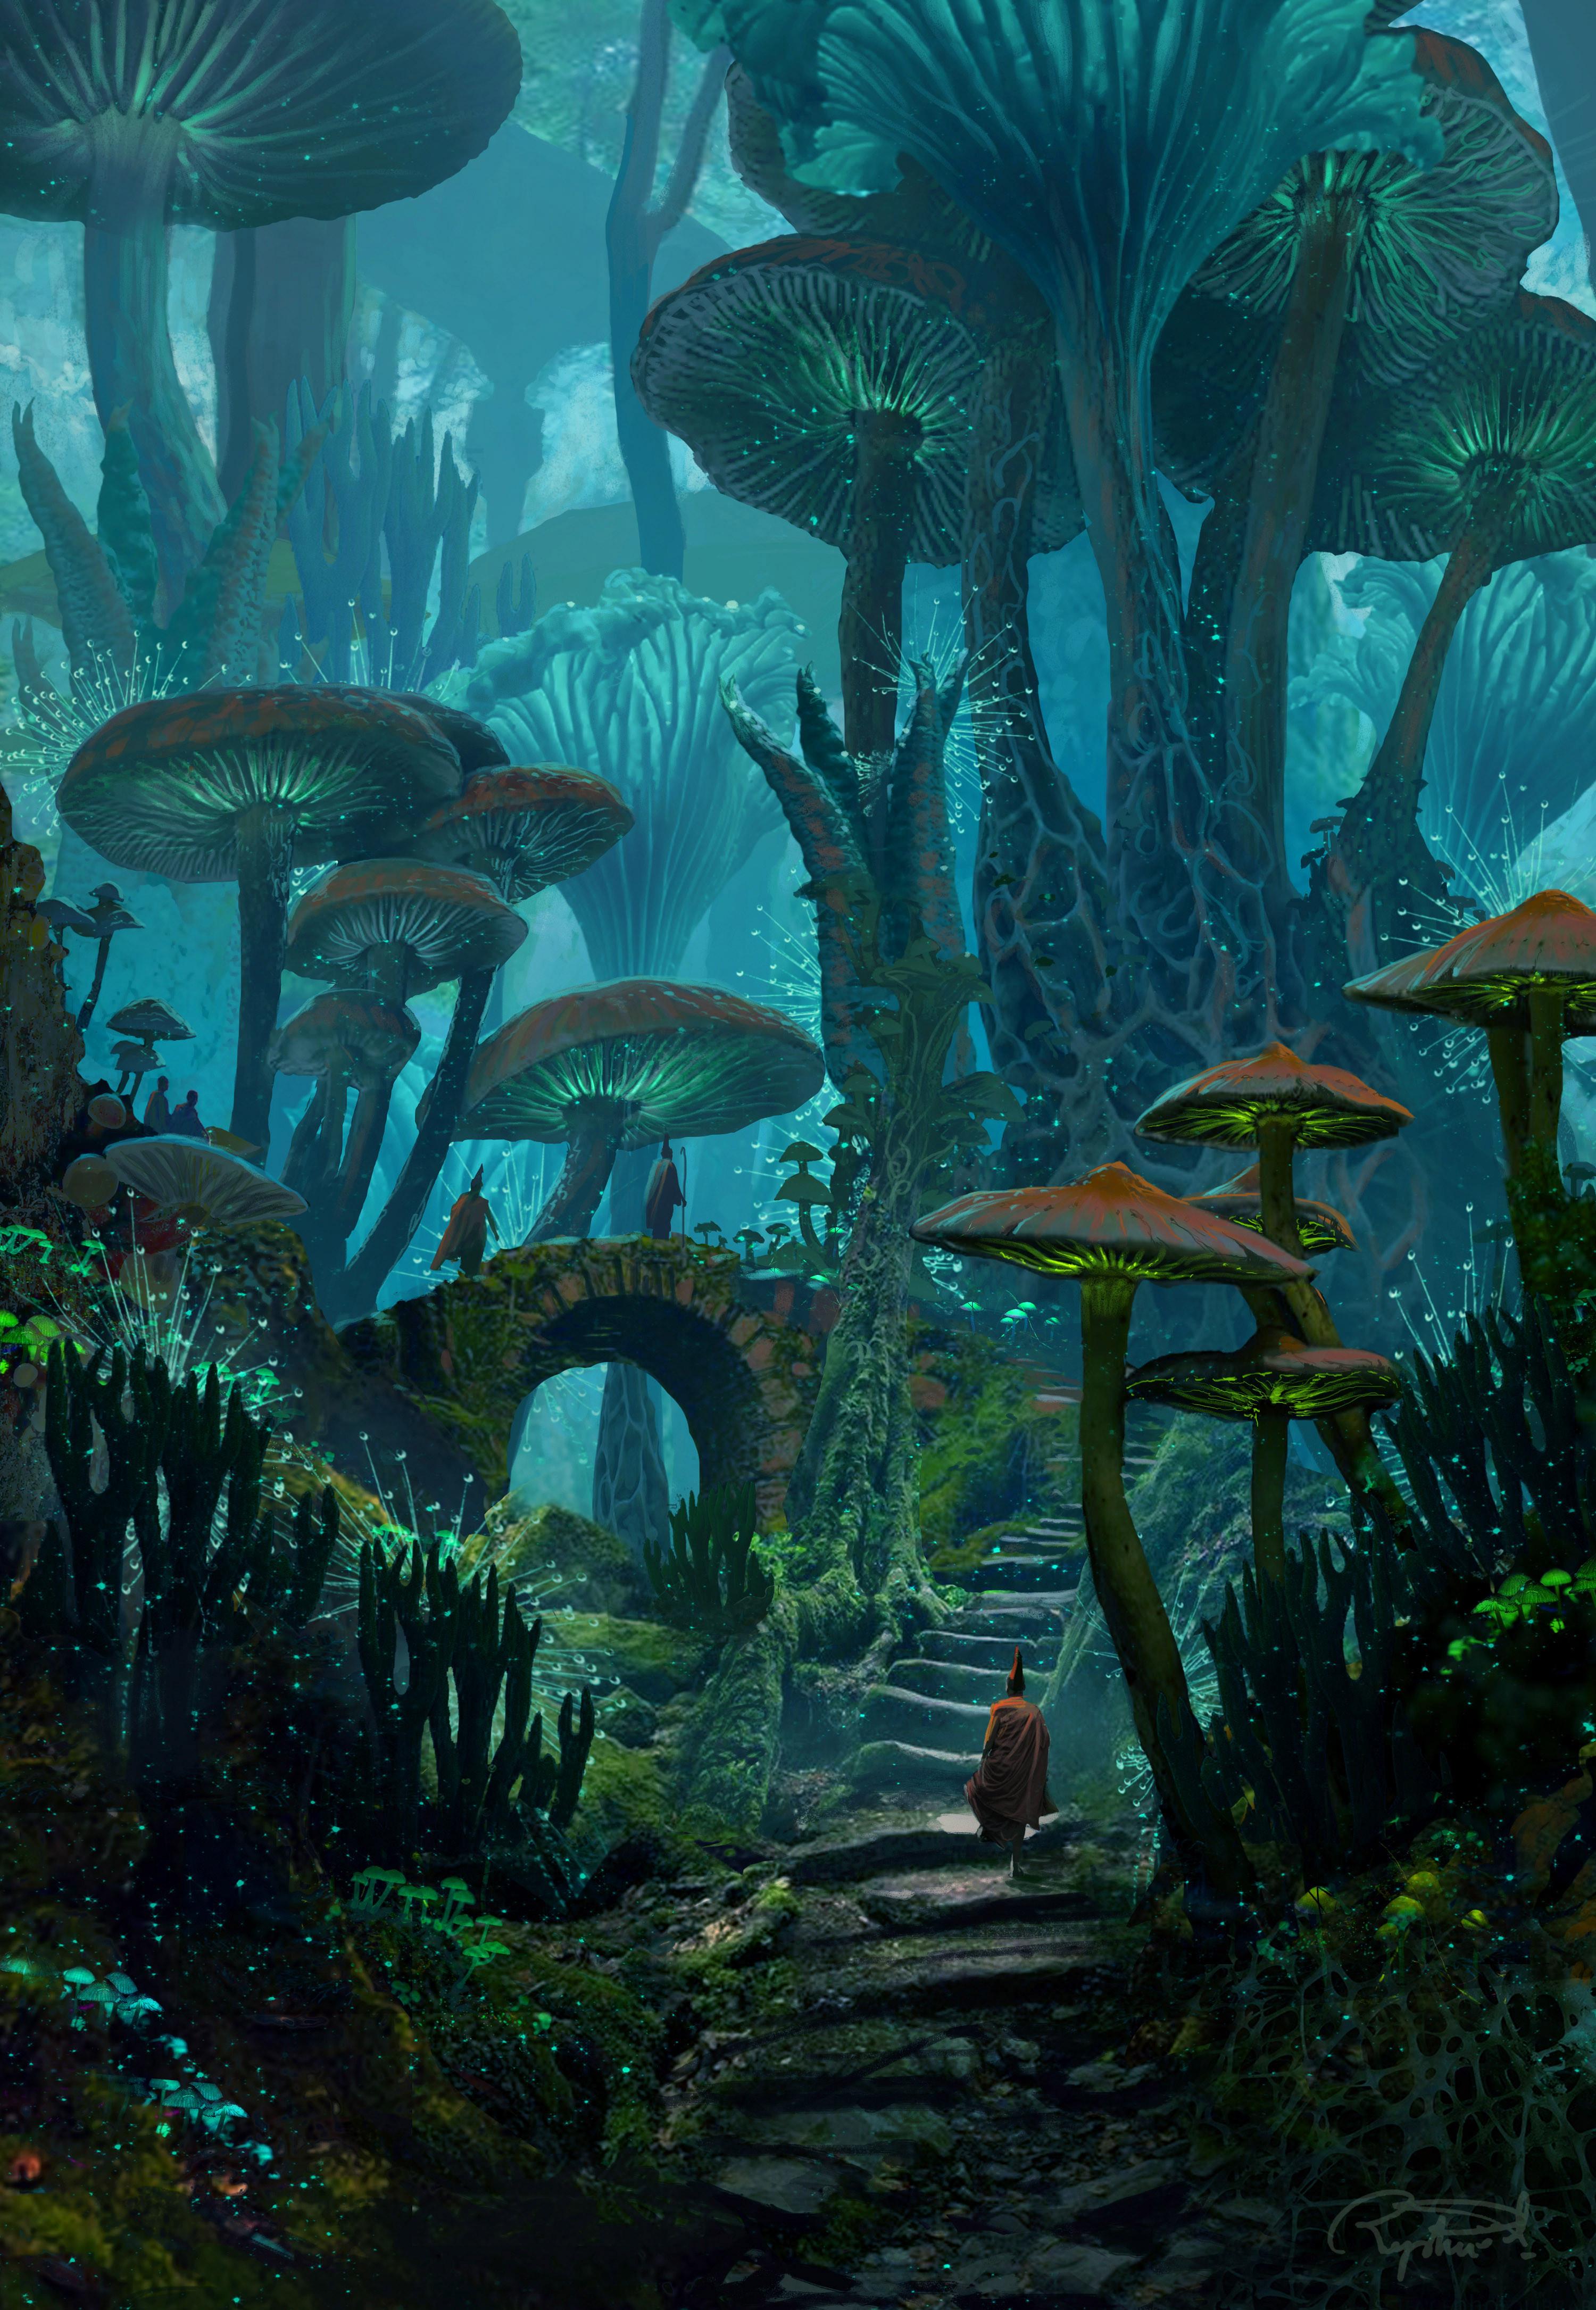 Bioluminescent Fungi